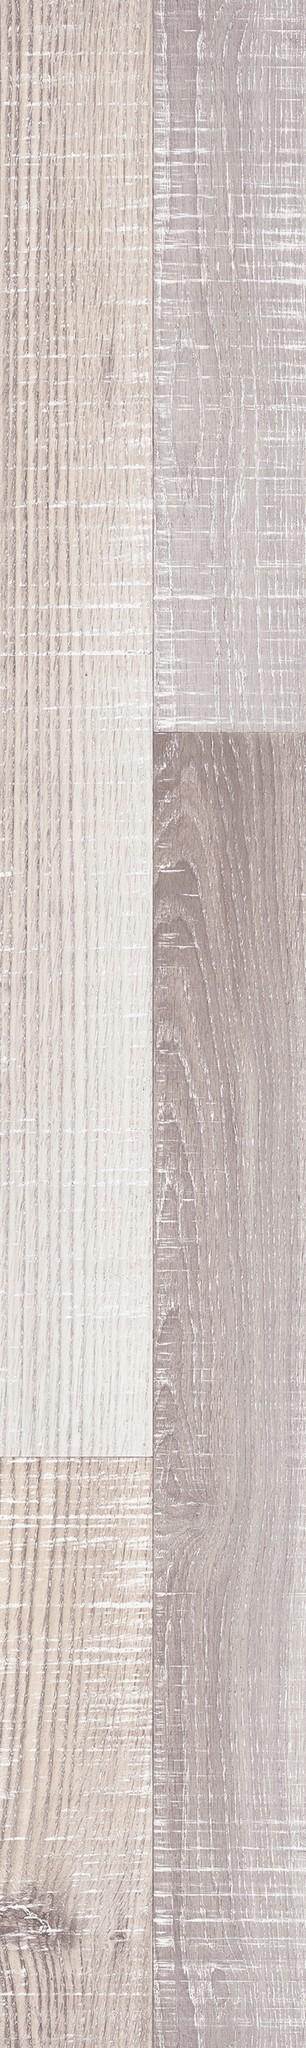 68e5b567ca124d94d445eb2834519a51.jpg